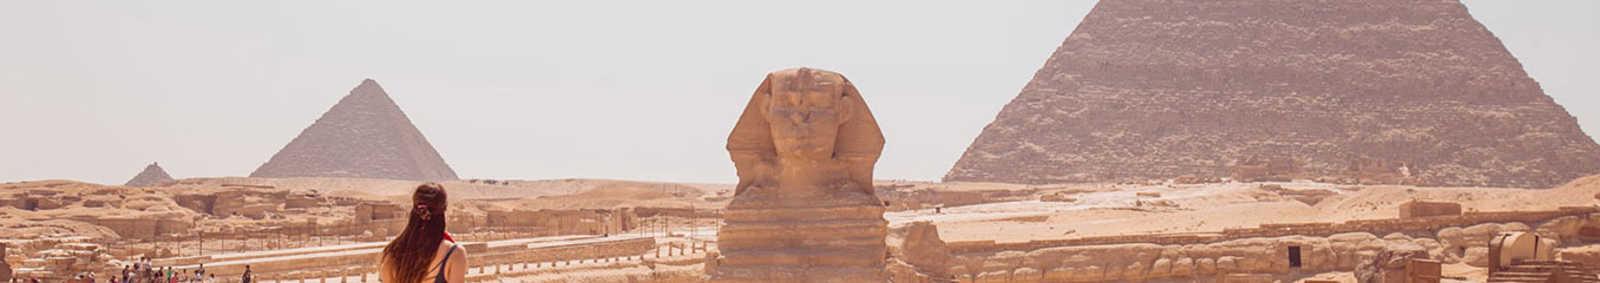 Giza in Egypt